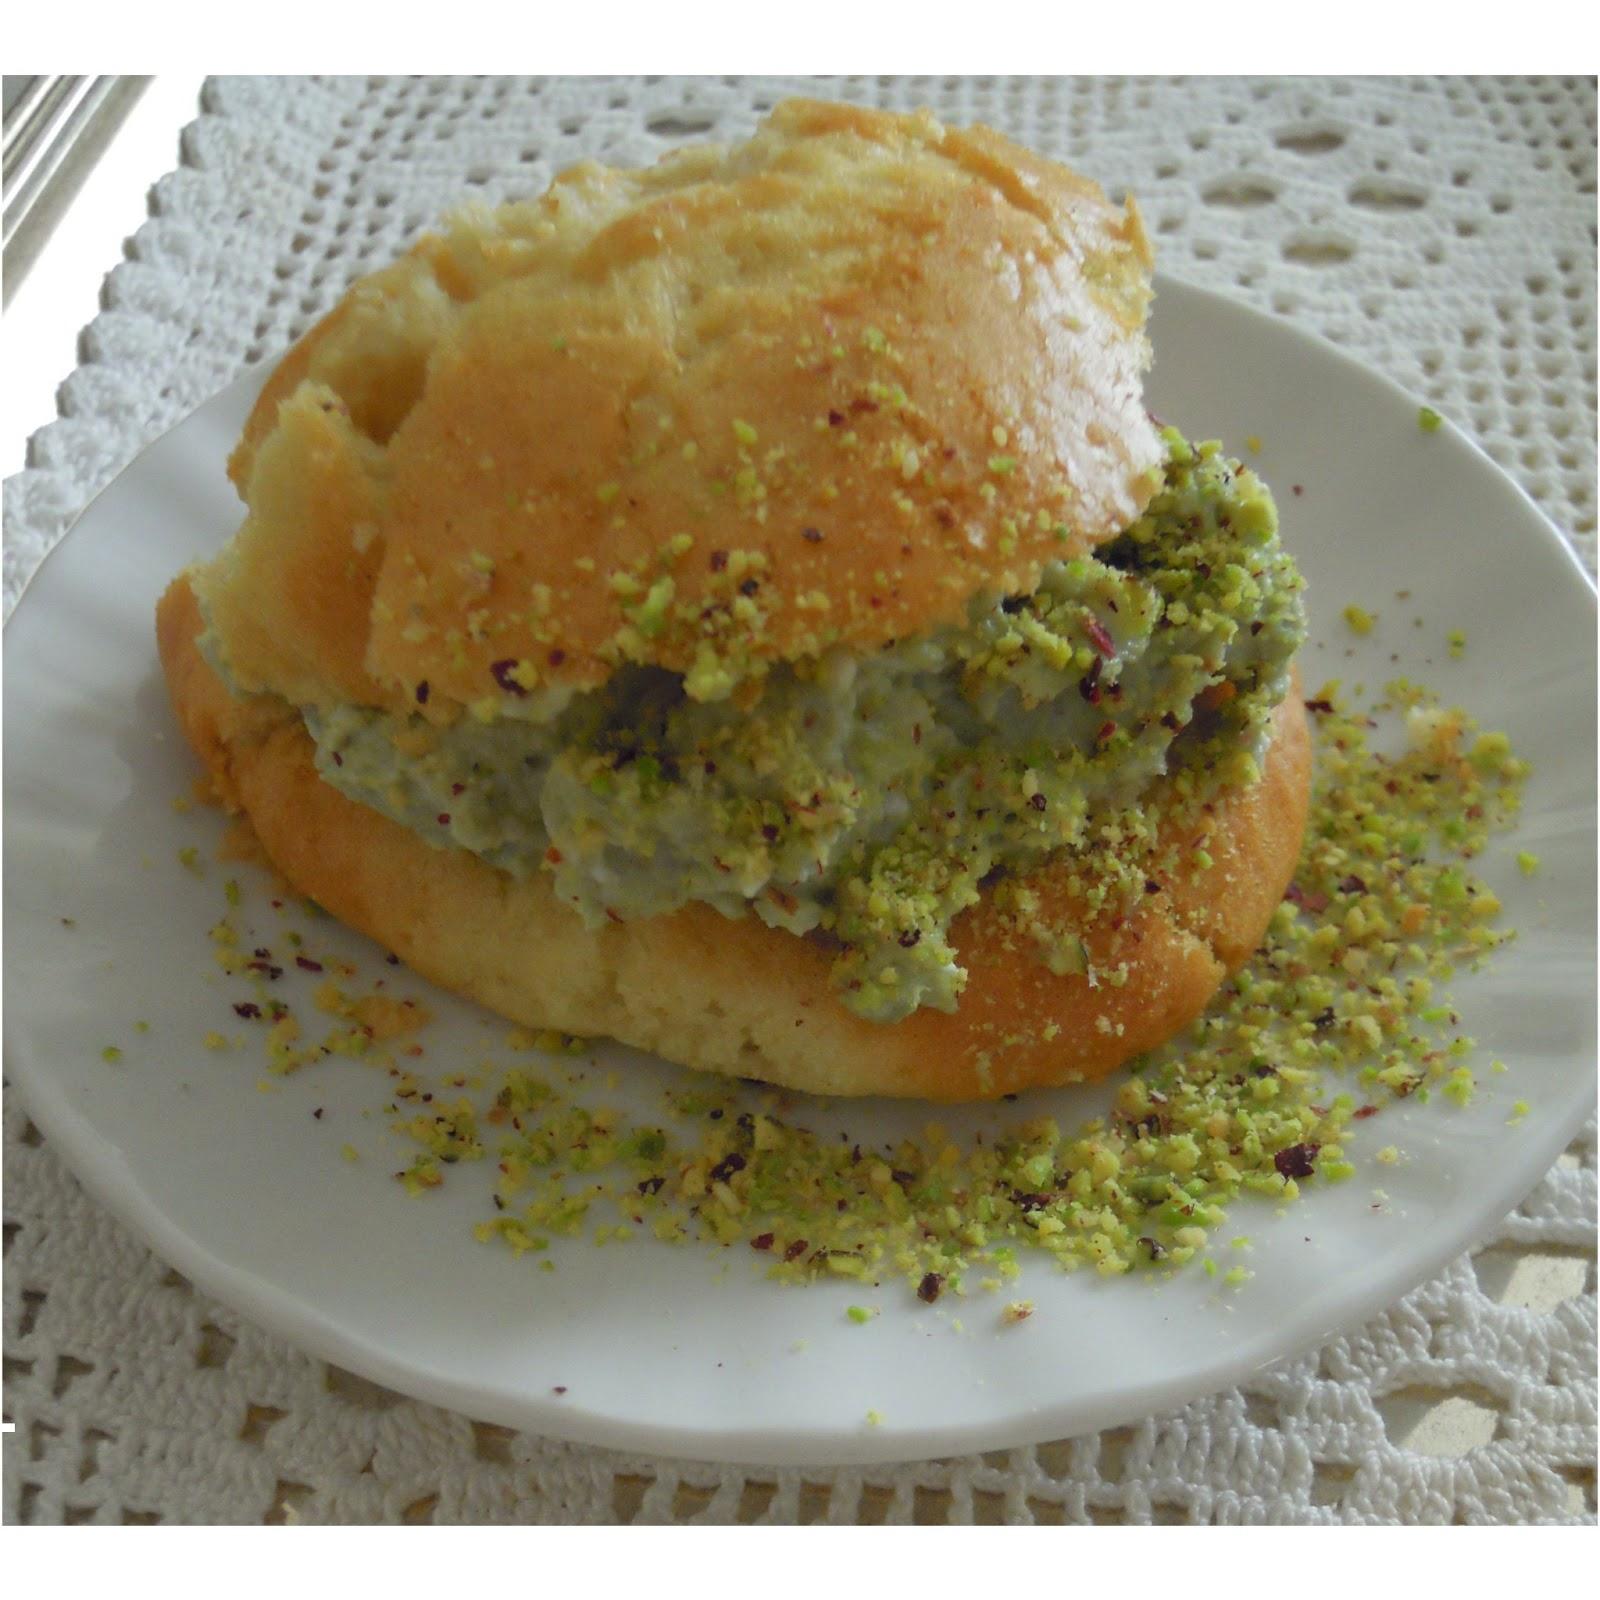 http://cresciutiapastasciutta.blogspot.it/2013/06/limoni-ed-ulivi.html